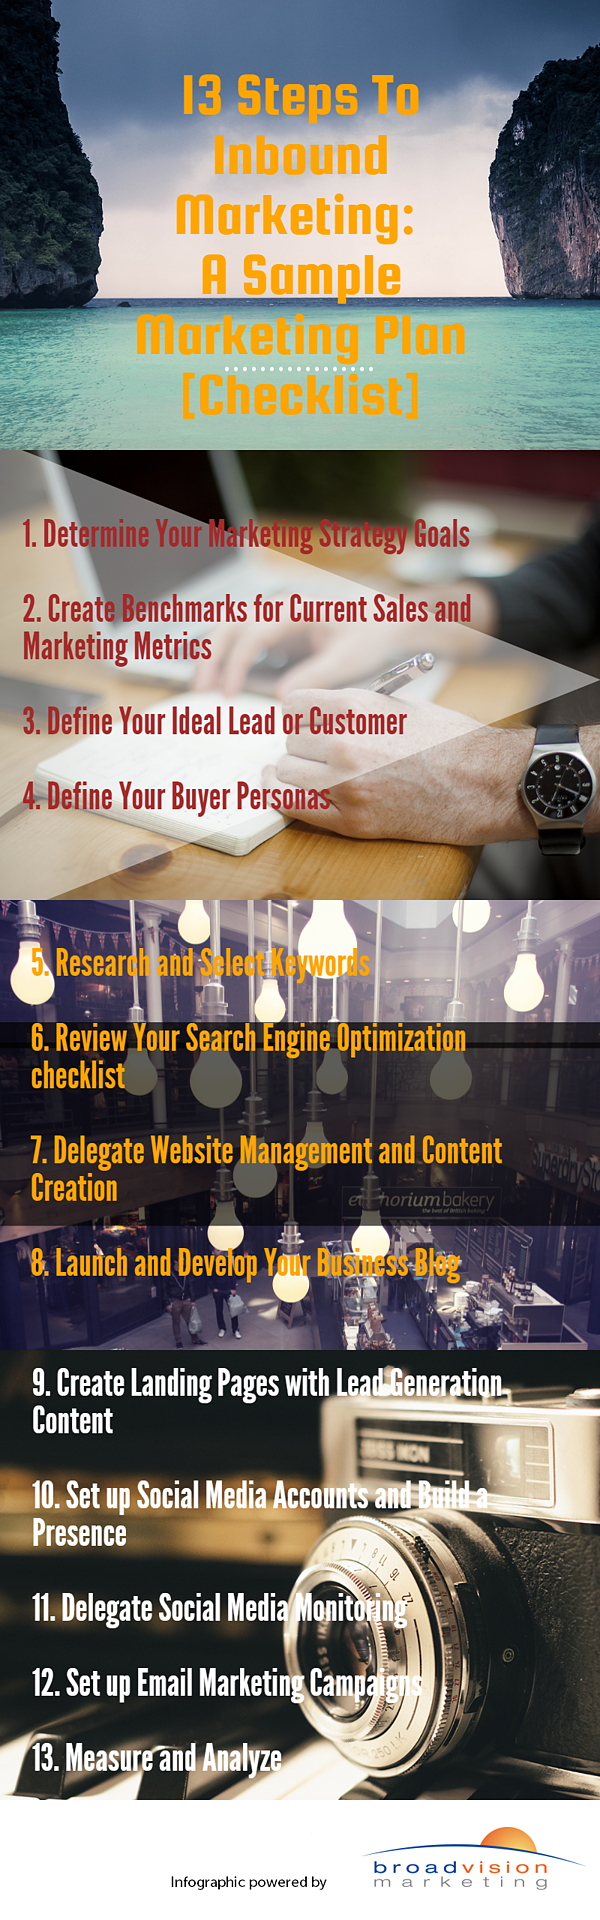 13-steps-of-sample-marketing-plan